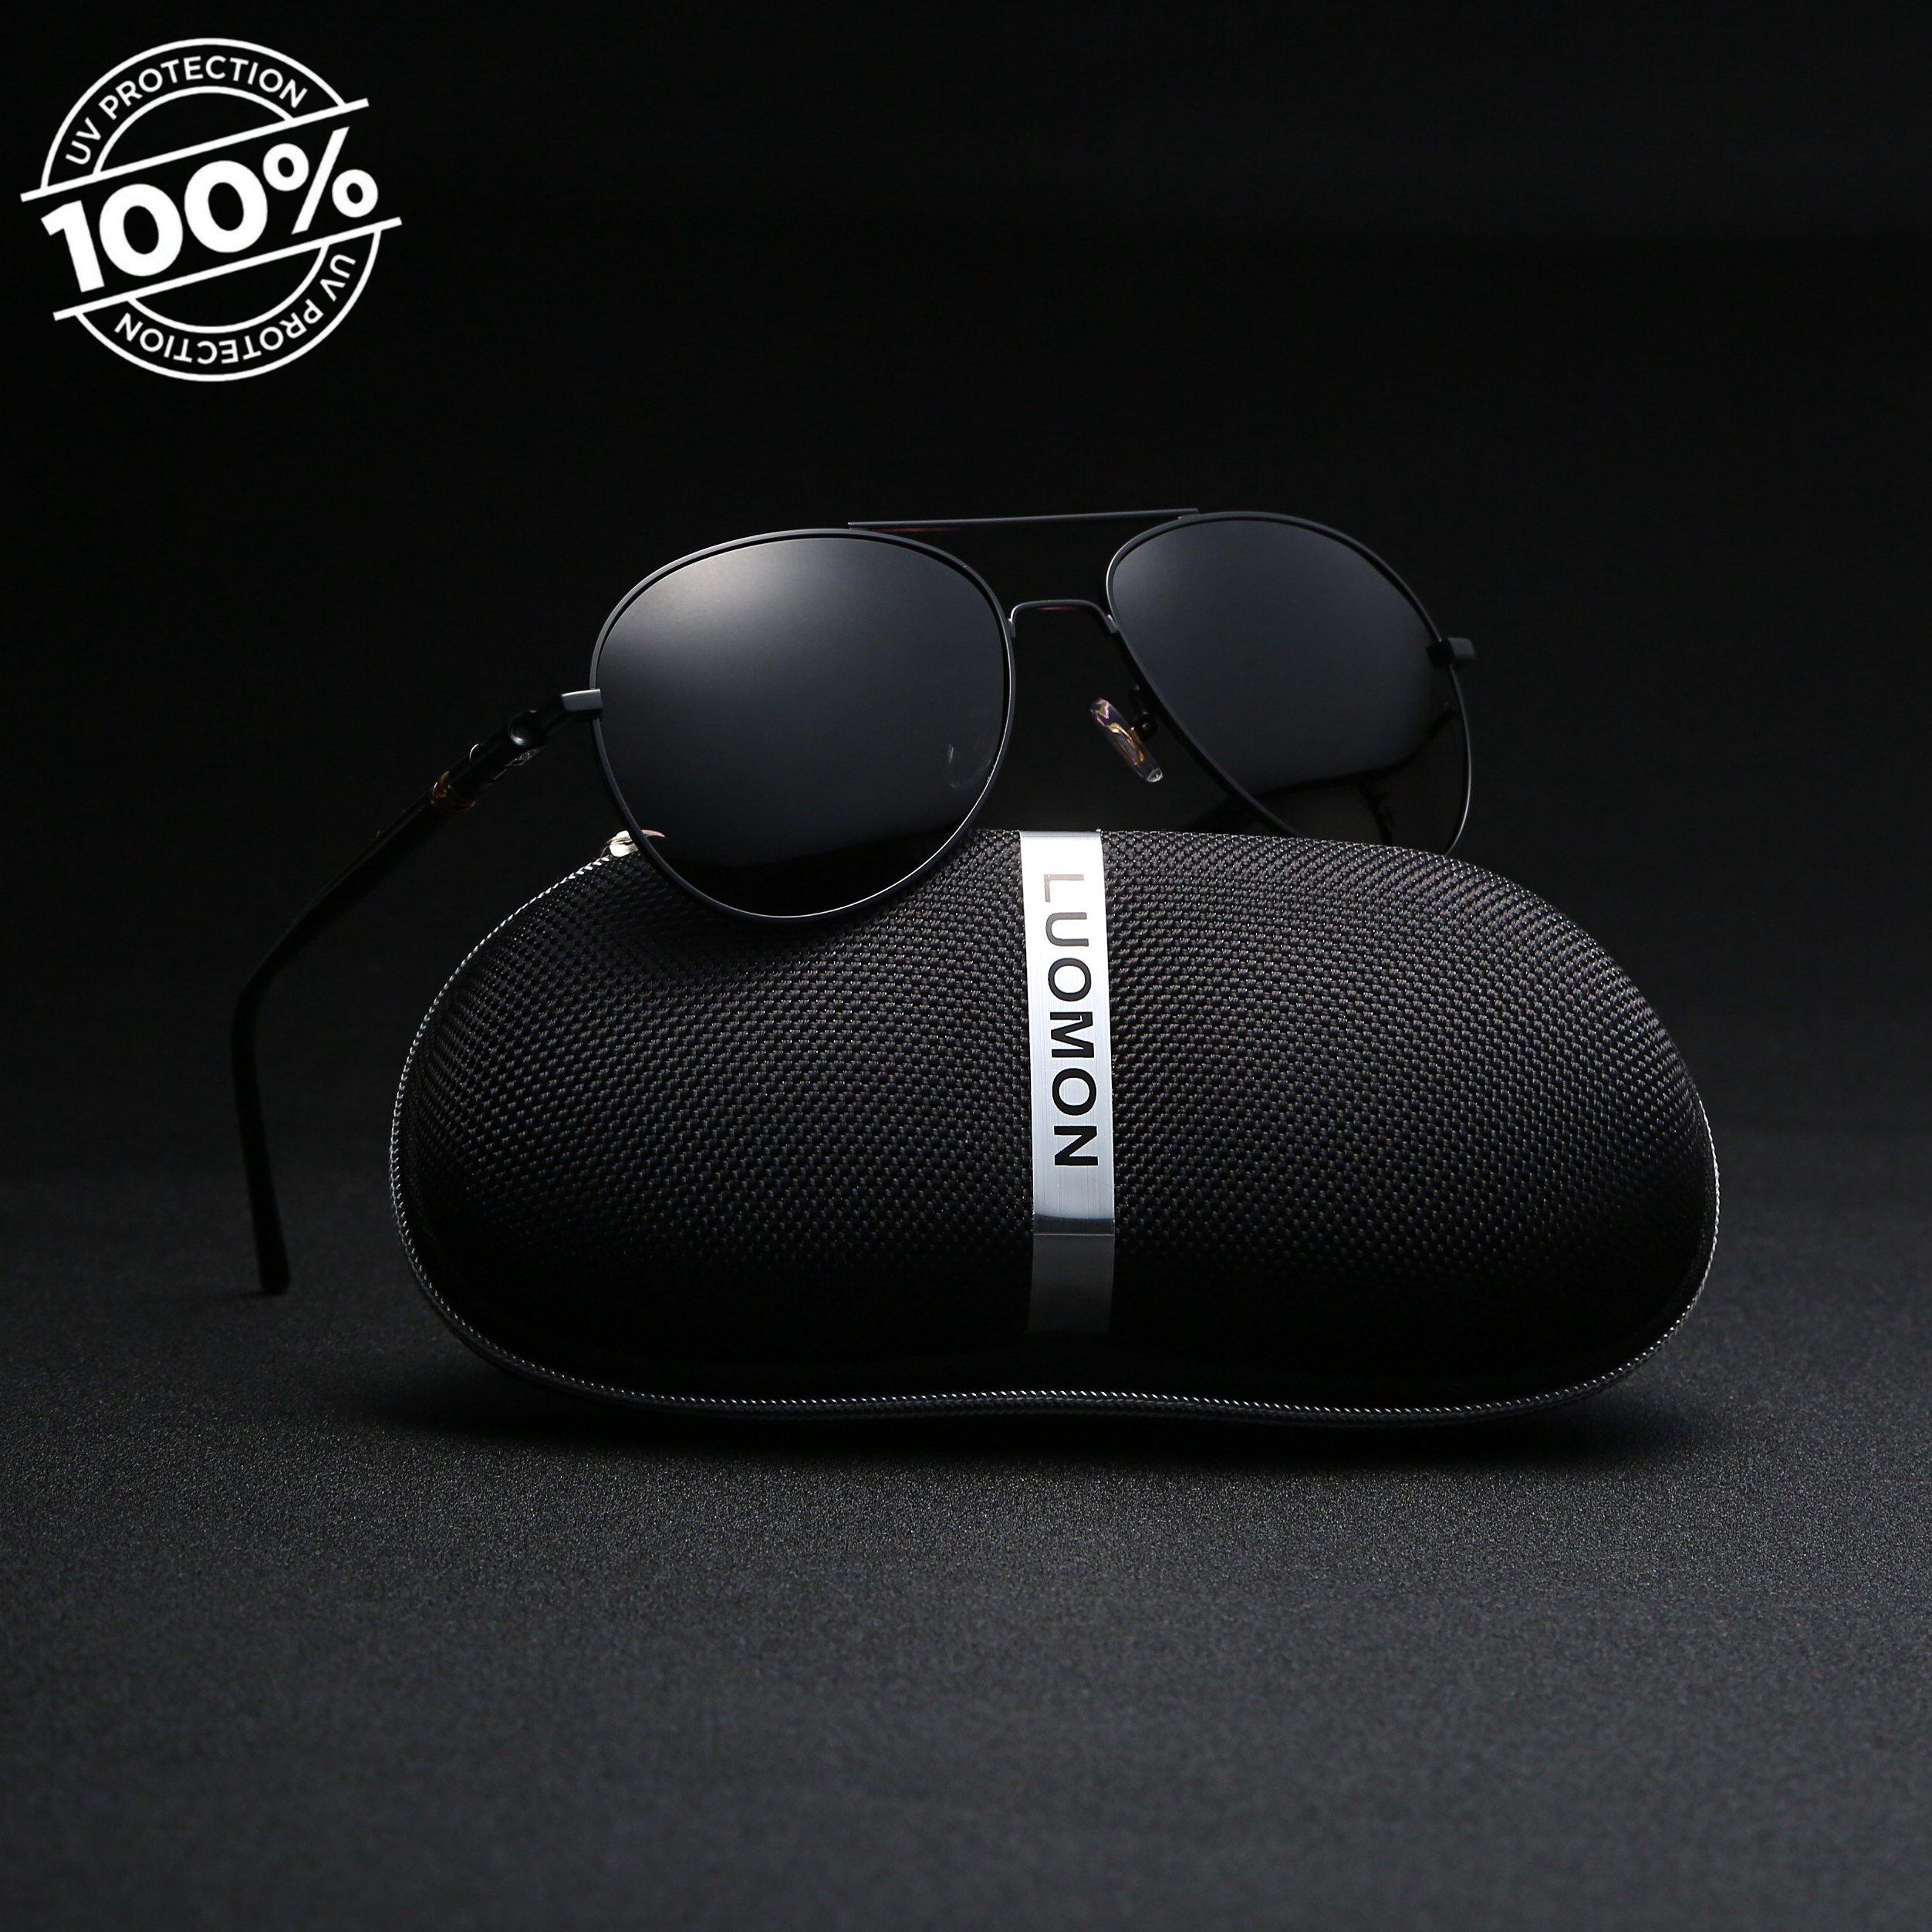 c48d3967d4 LUOMON MB209 Black Frame Grey Lens Polarized Aviator Sunglasses -  160620MB209-BLG   Sunglasses   Clothing